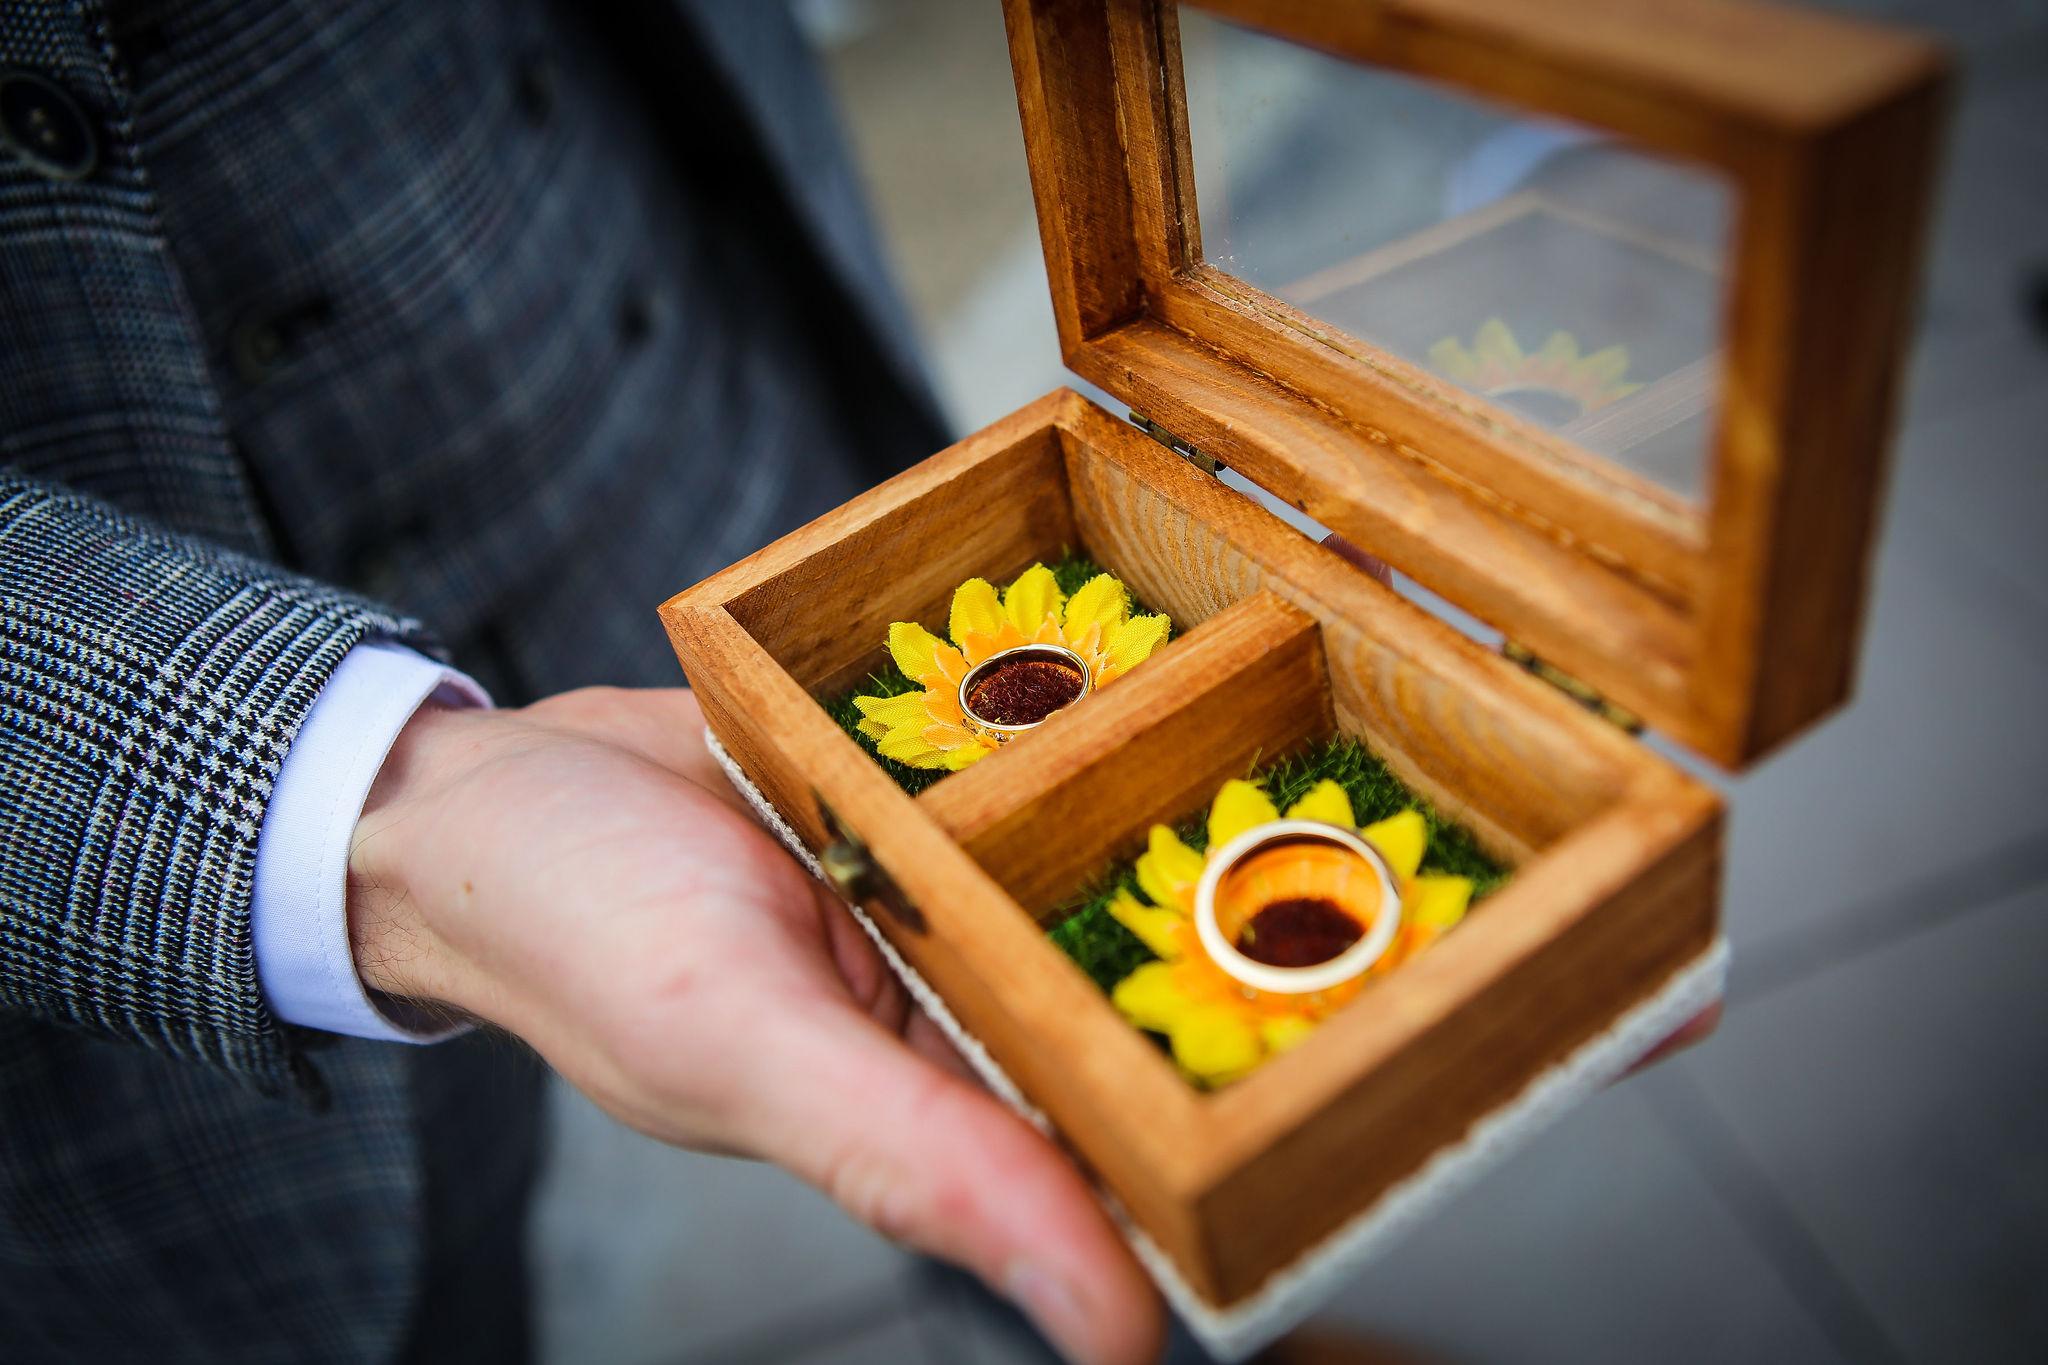 Harriet&Rhys Wedding - sunflower wedding ring presentation box